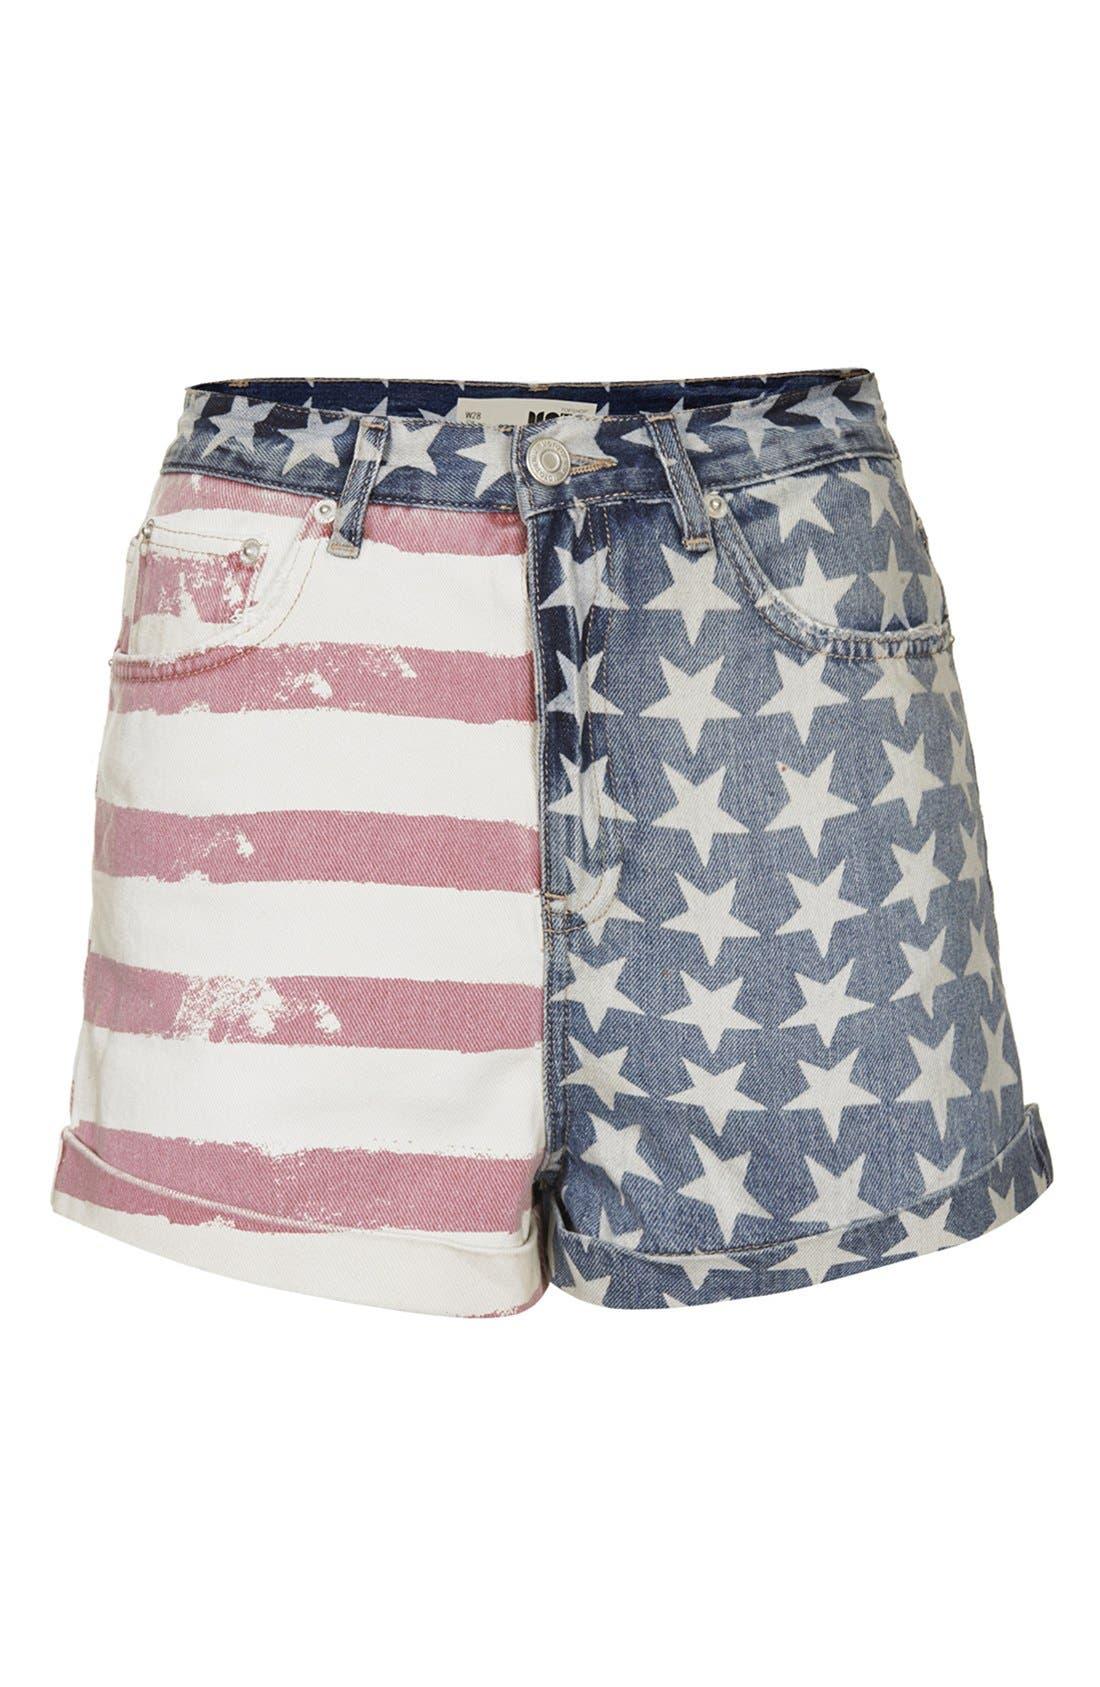 Alternate Image 1 Selected - Topshop 'Mom' Flag Print High Rise Denim Shorts